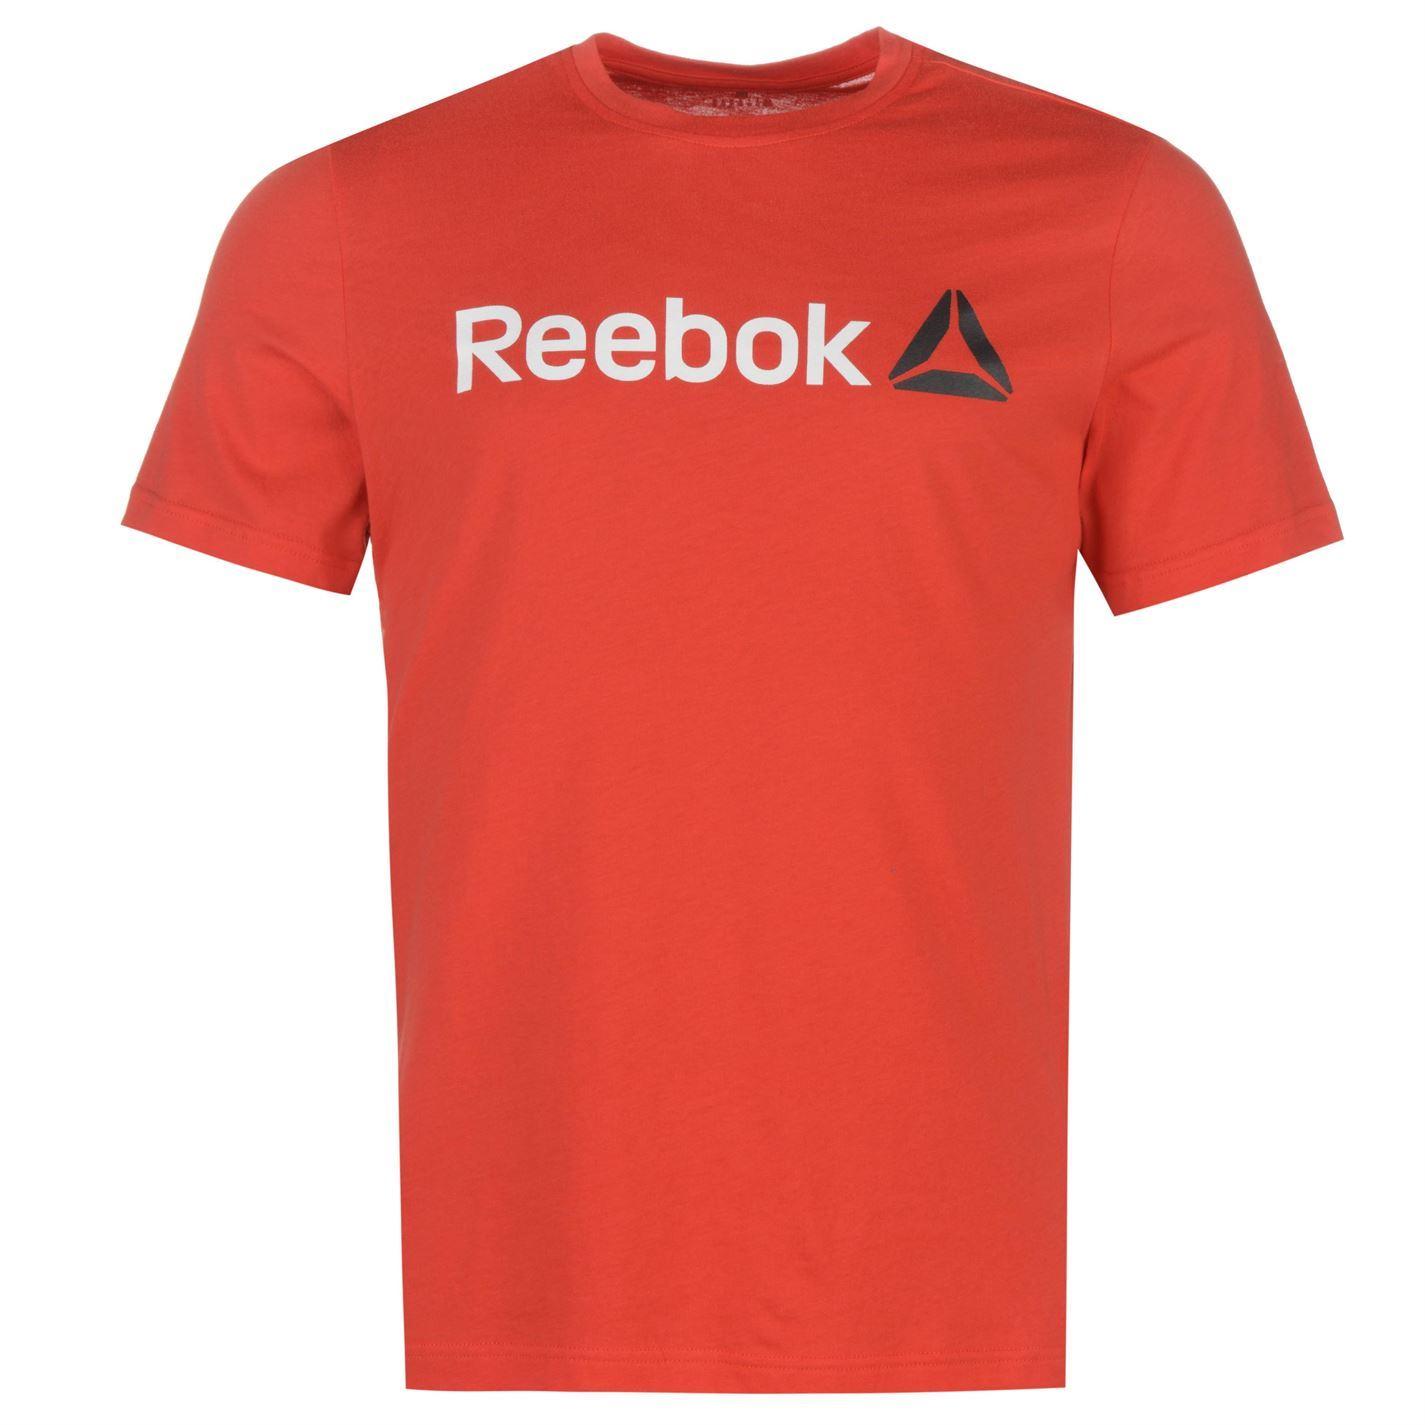 Reebok-Delta-Logo-T-Shirt-Mens-Tee-Shirt-Top thumbnail 34